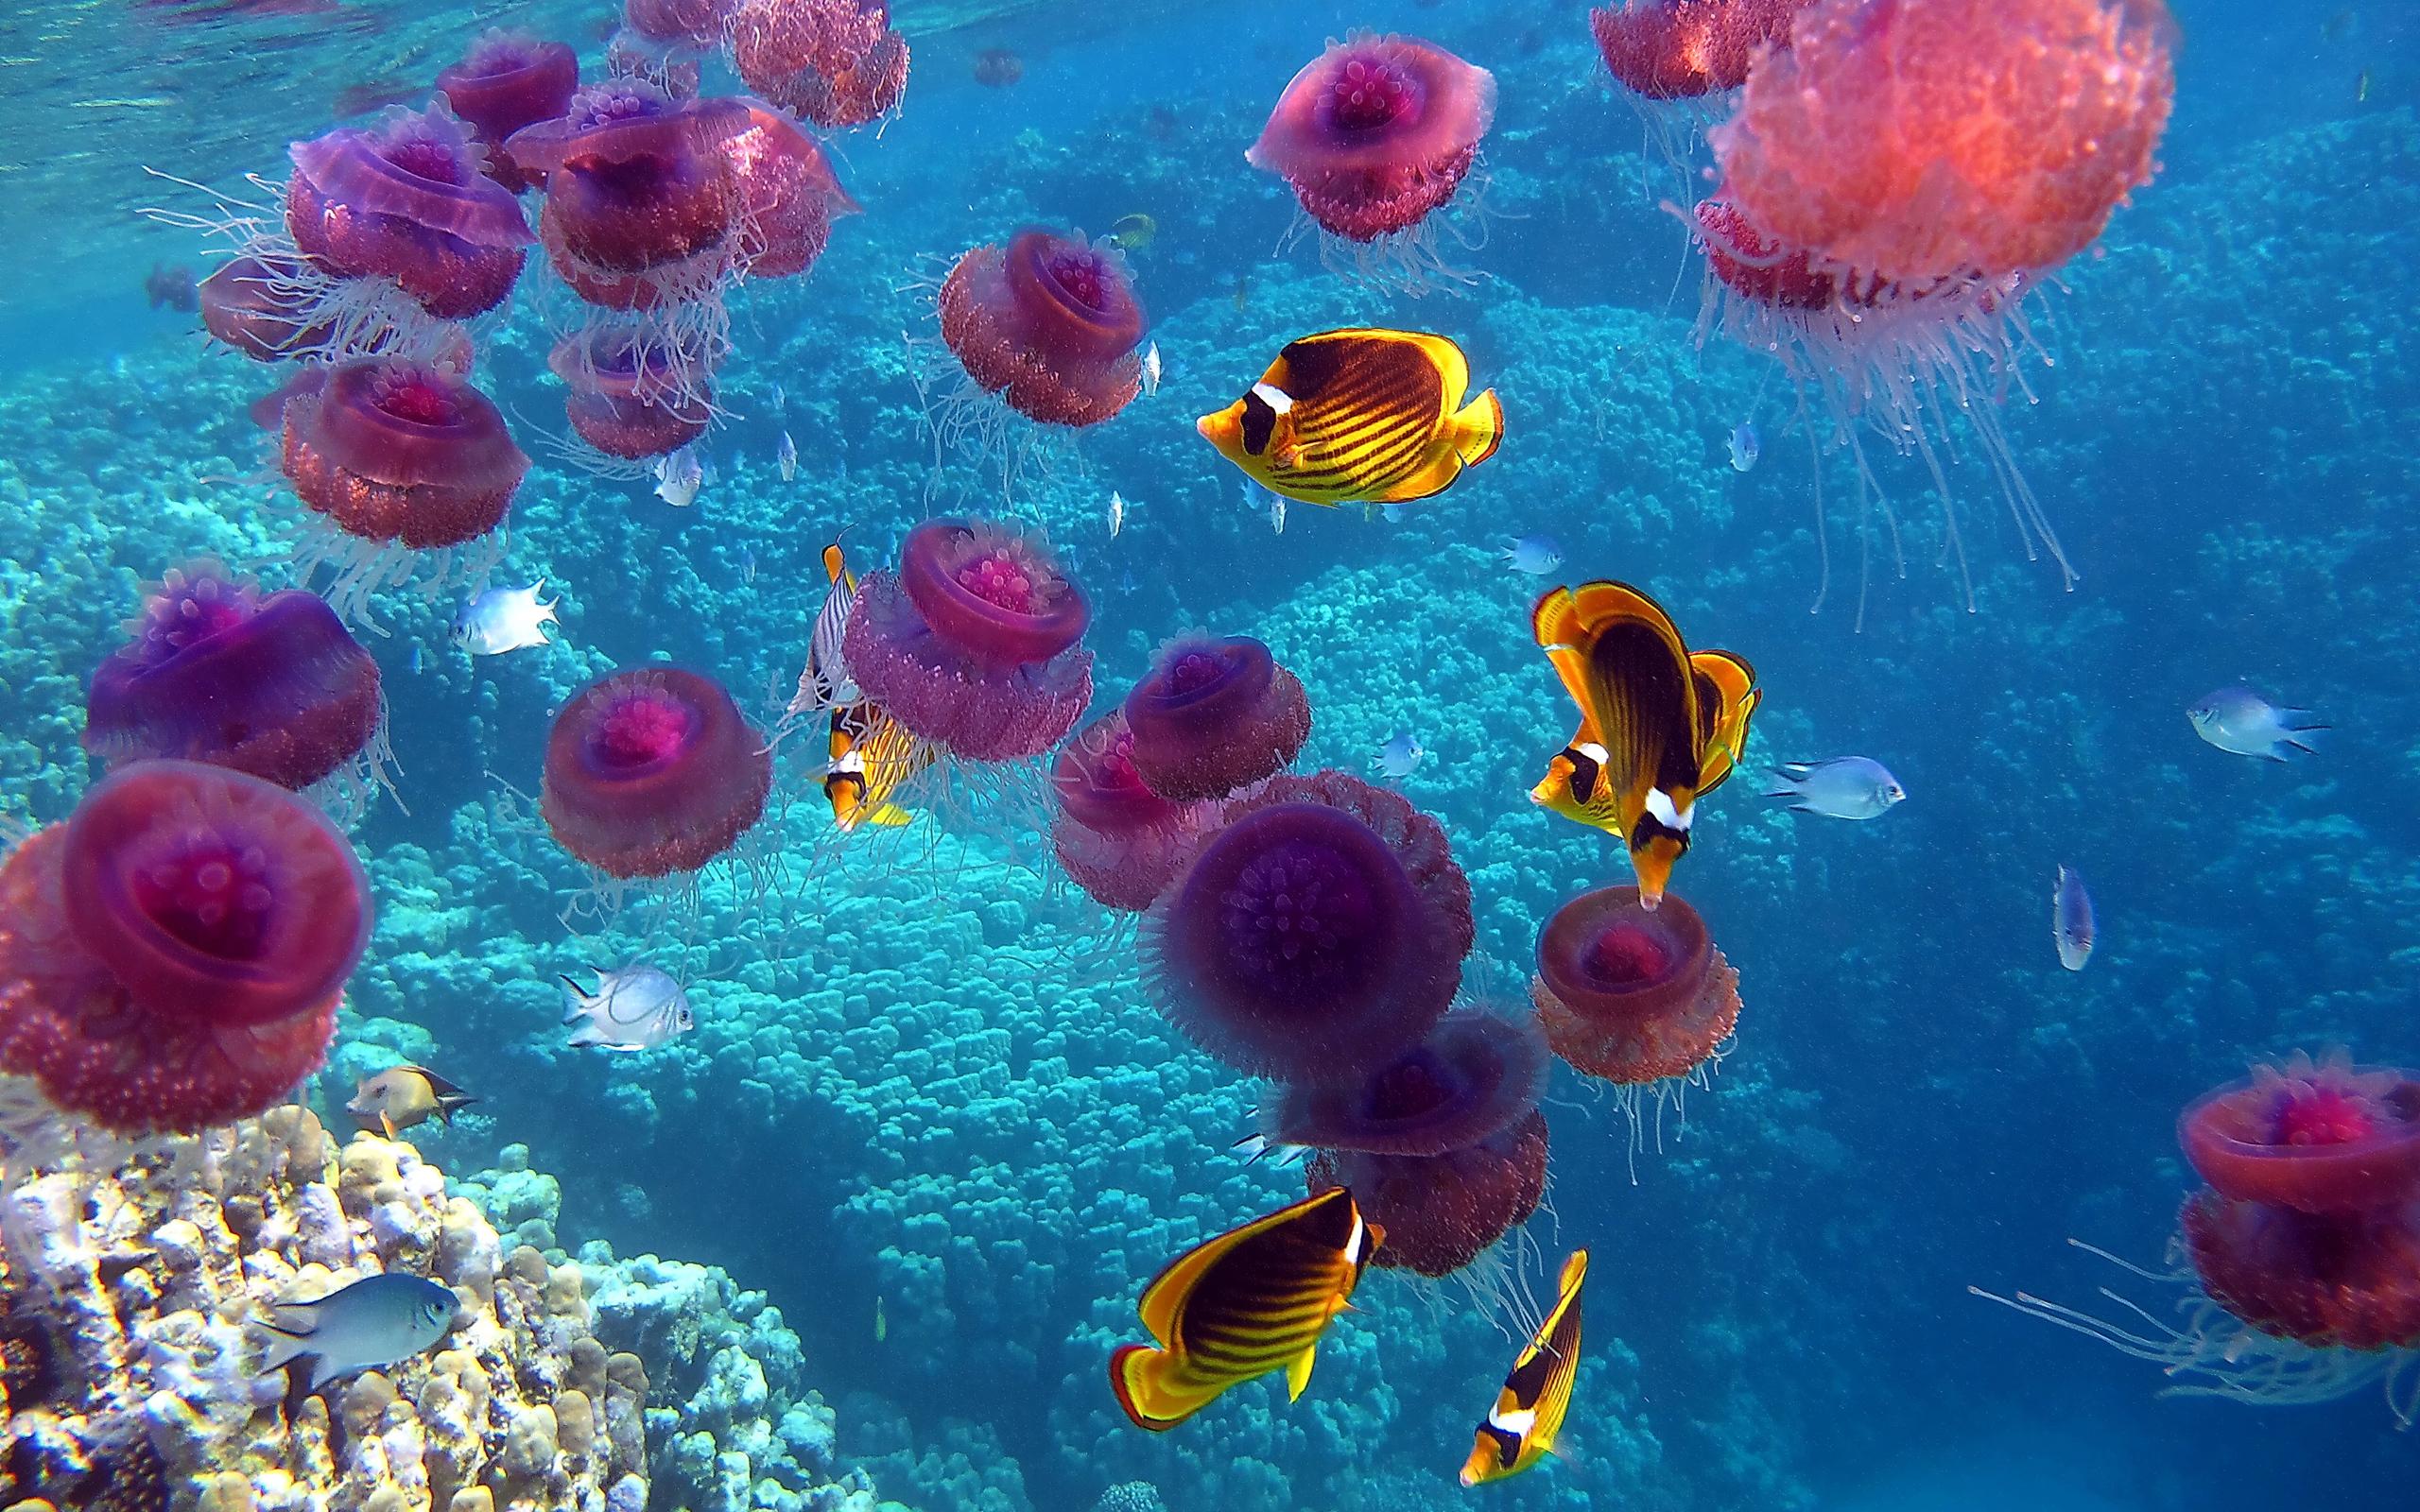 рыбы, медузы, океан